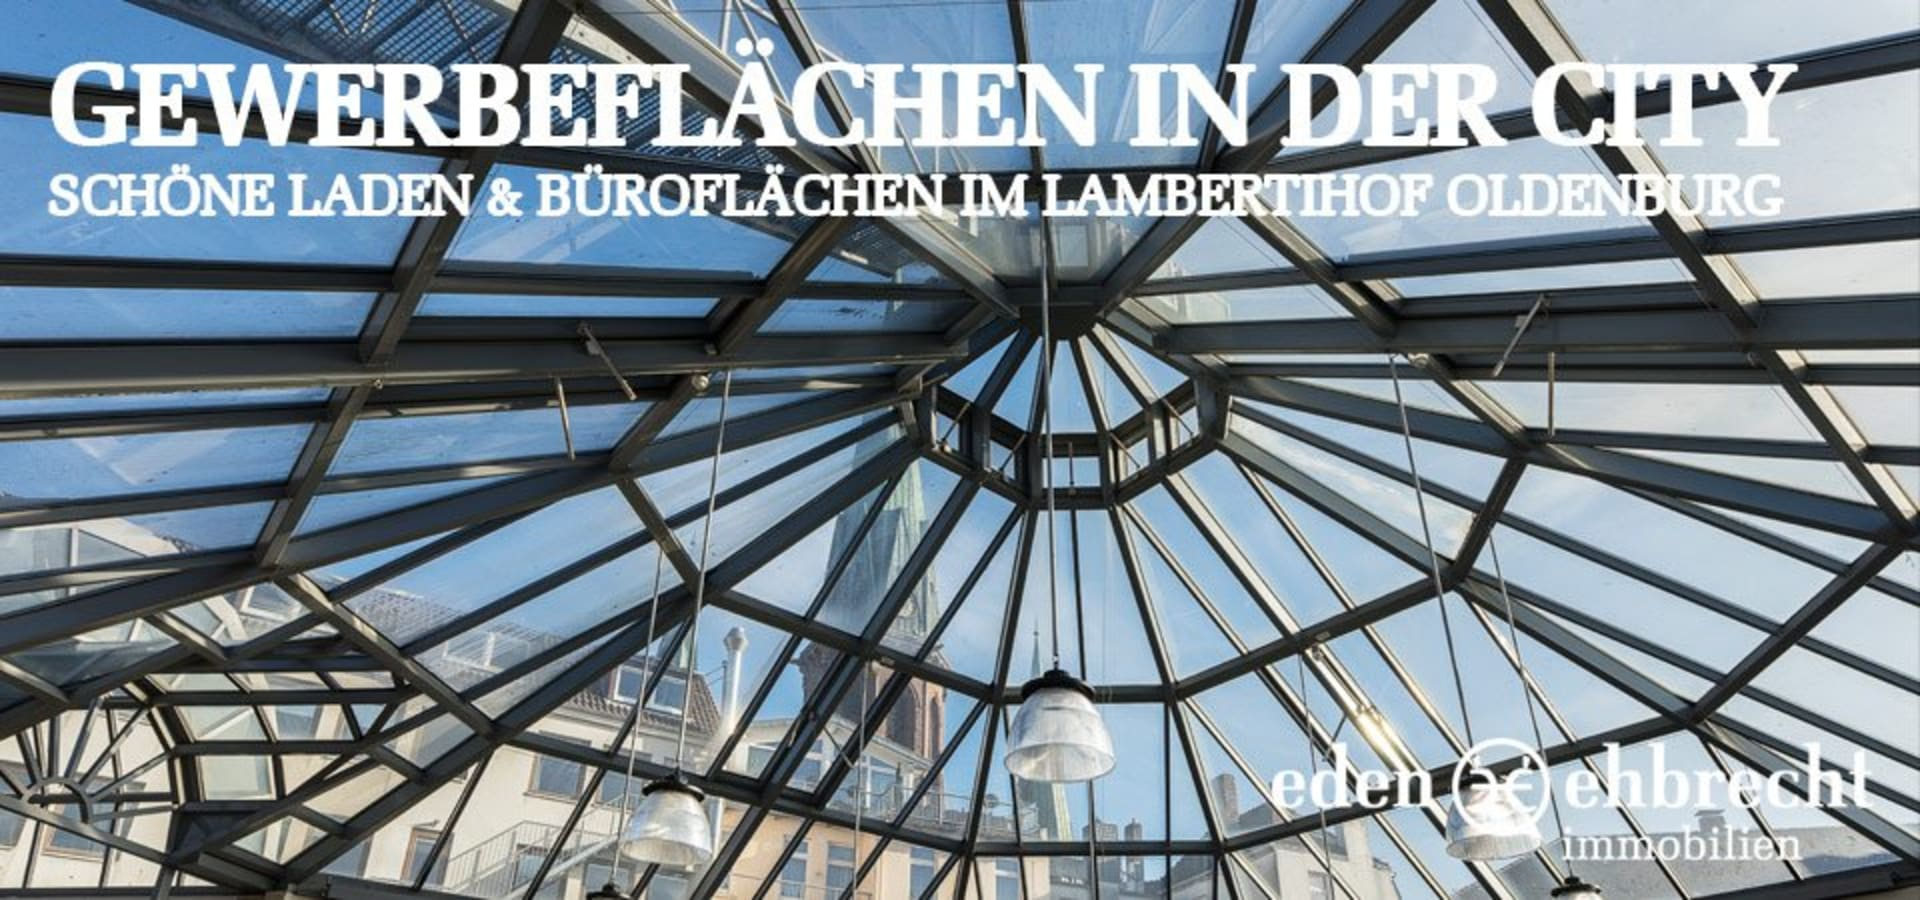 Eden-Ehbrecht Immobilien & Marketing GbR